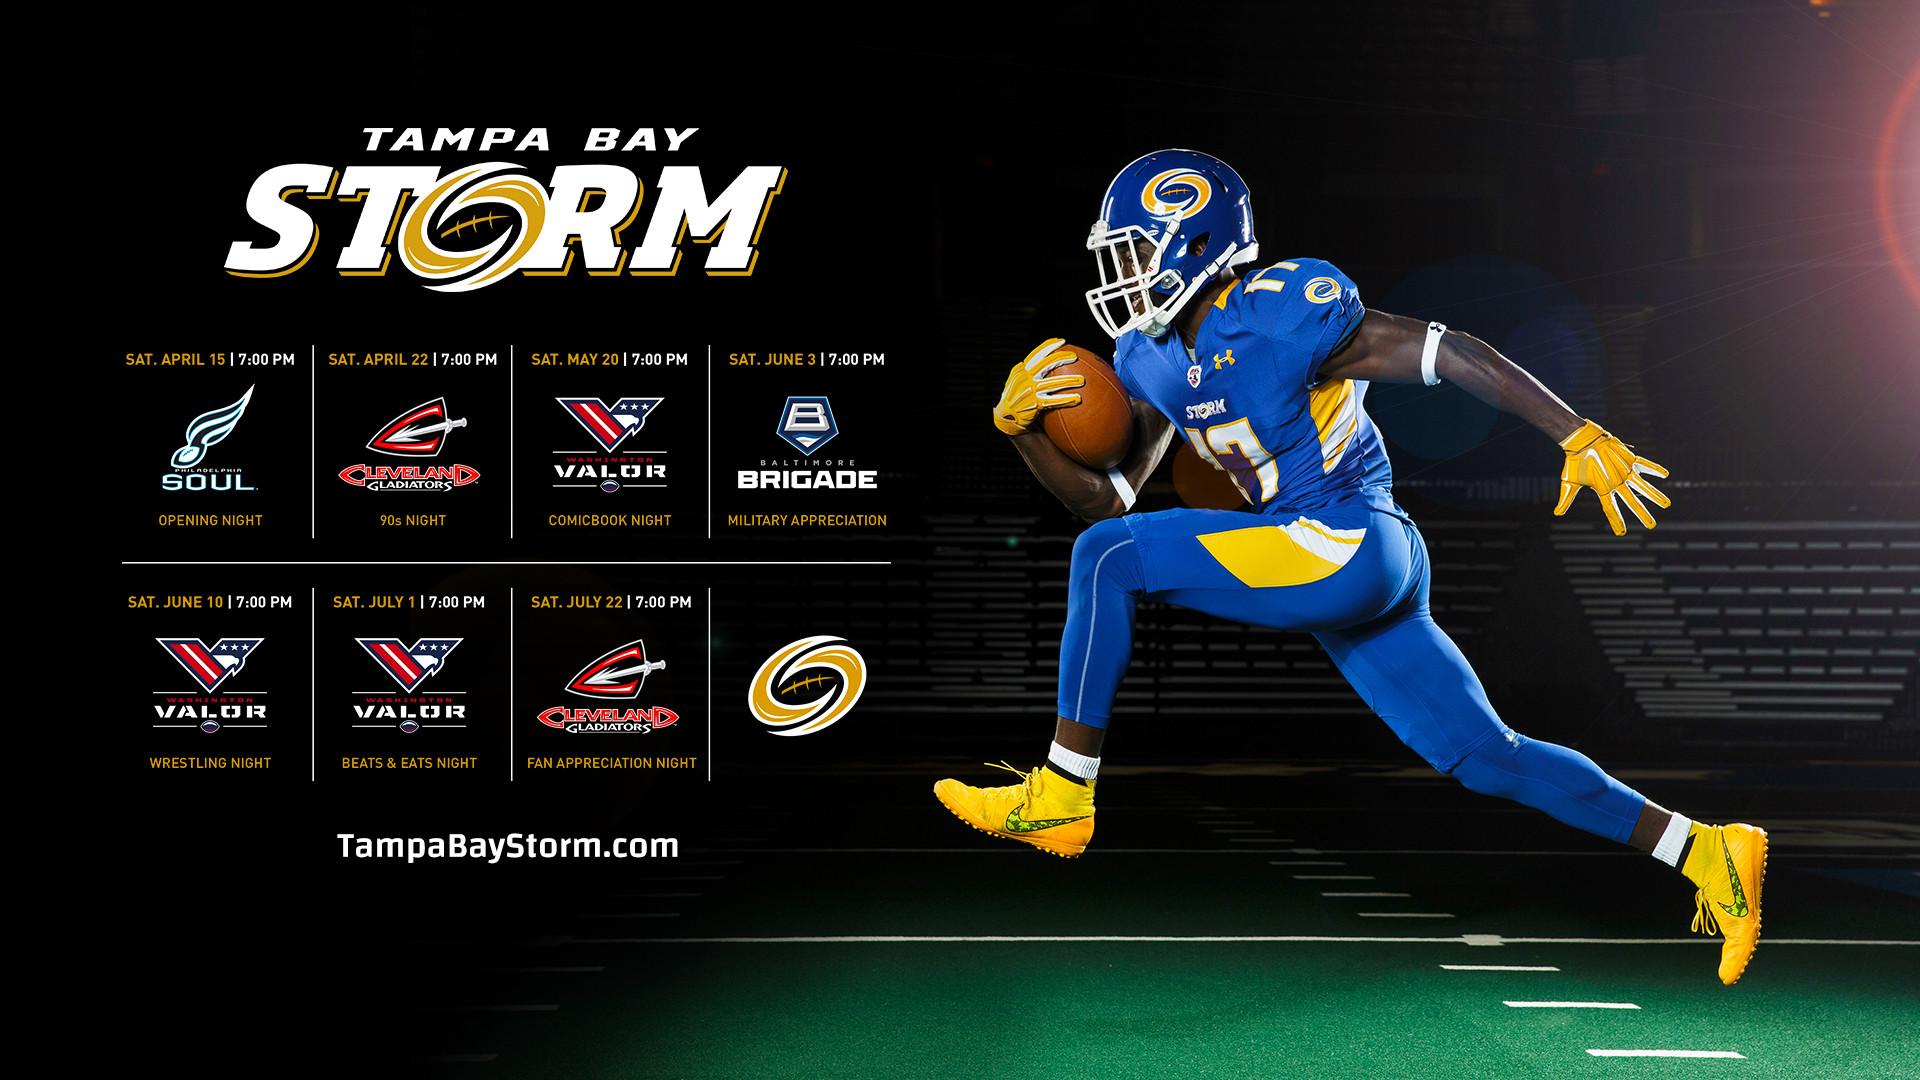 2017 Tampa Bay Storm Wallpaper